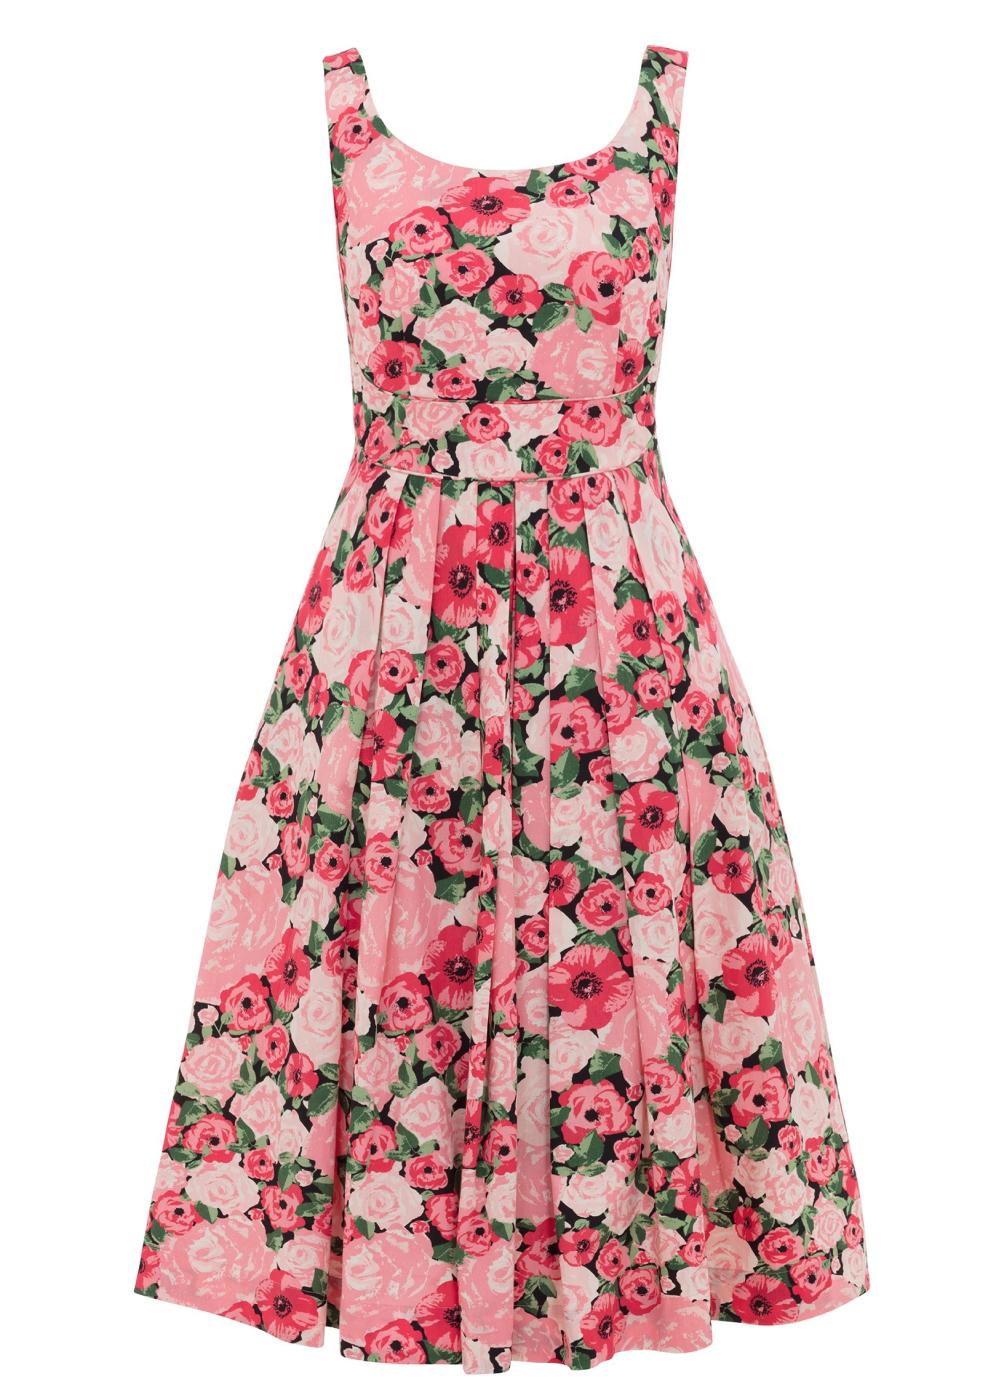 Tant Sofia - Isobel dress - Paris Rose Garden, Emily anf Fin